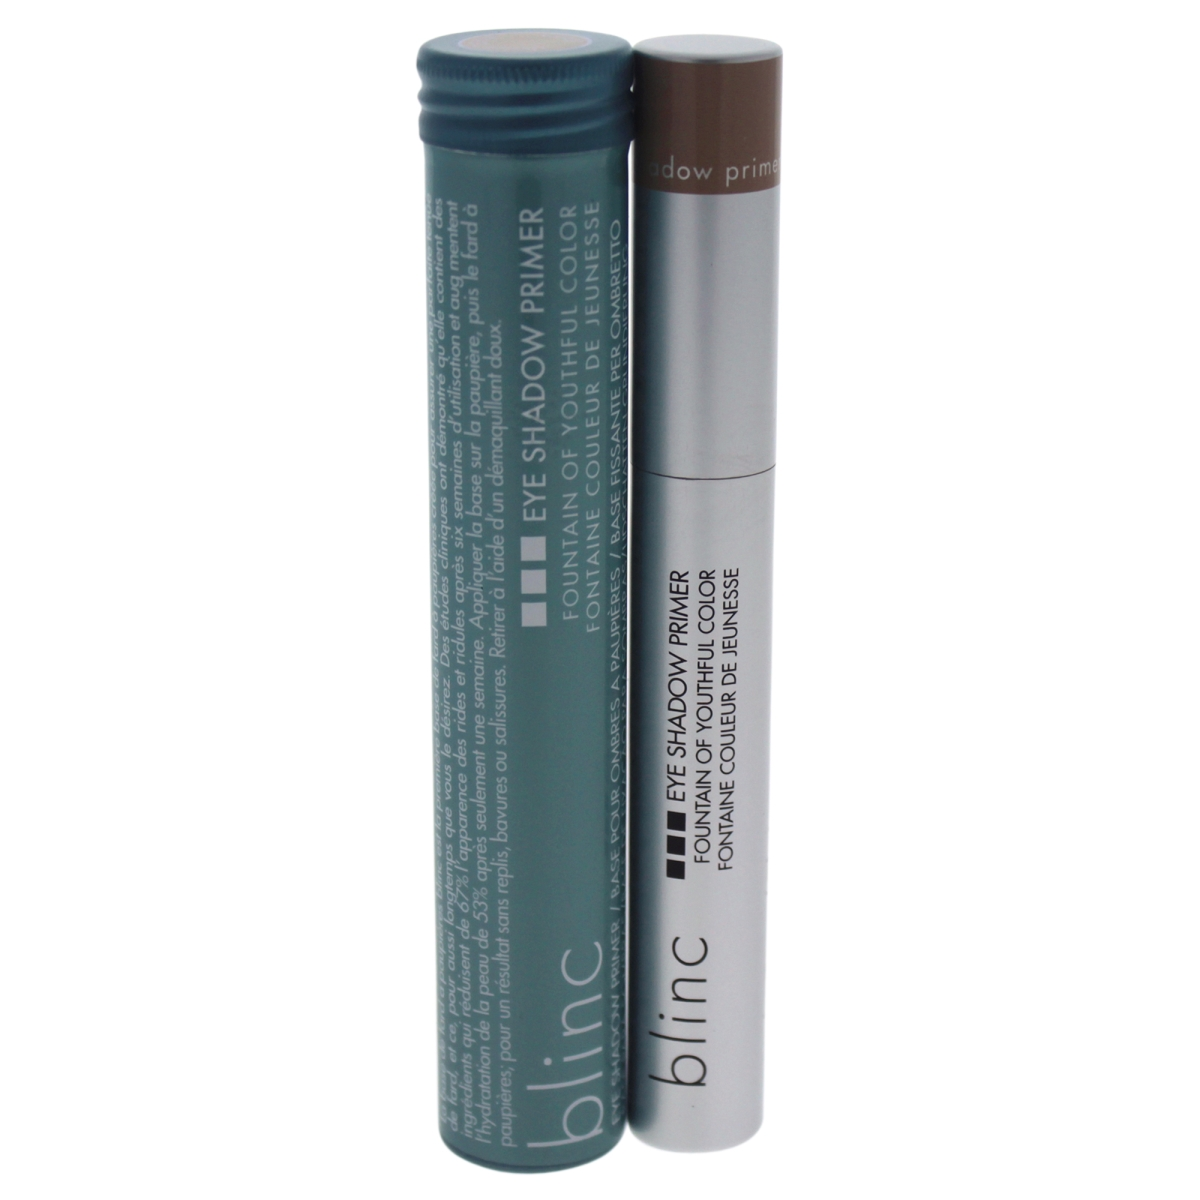 Blinc W-C-11760 0.14 oz Primer Eyeshadow for Women Light Tone